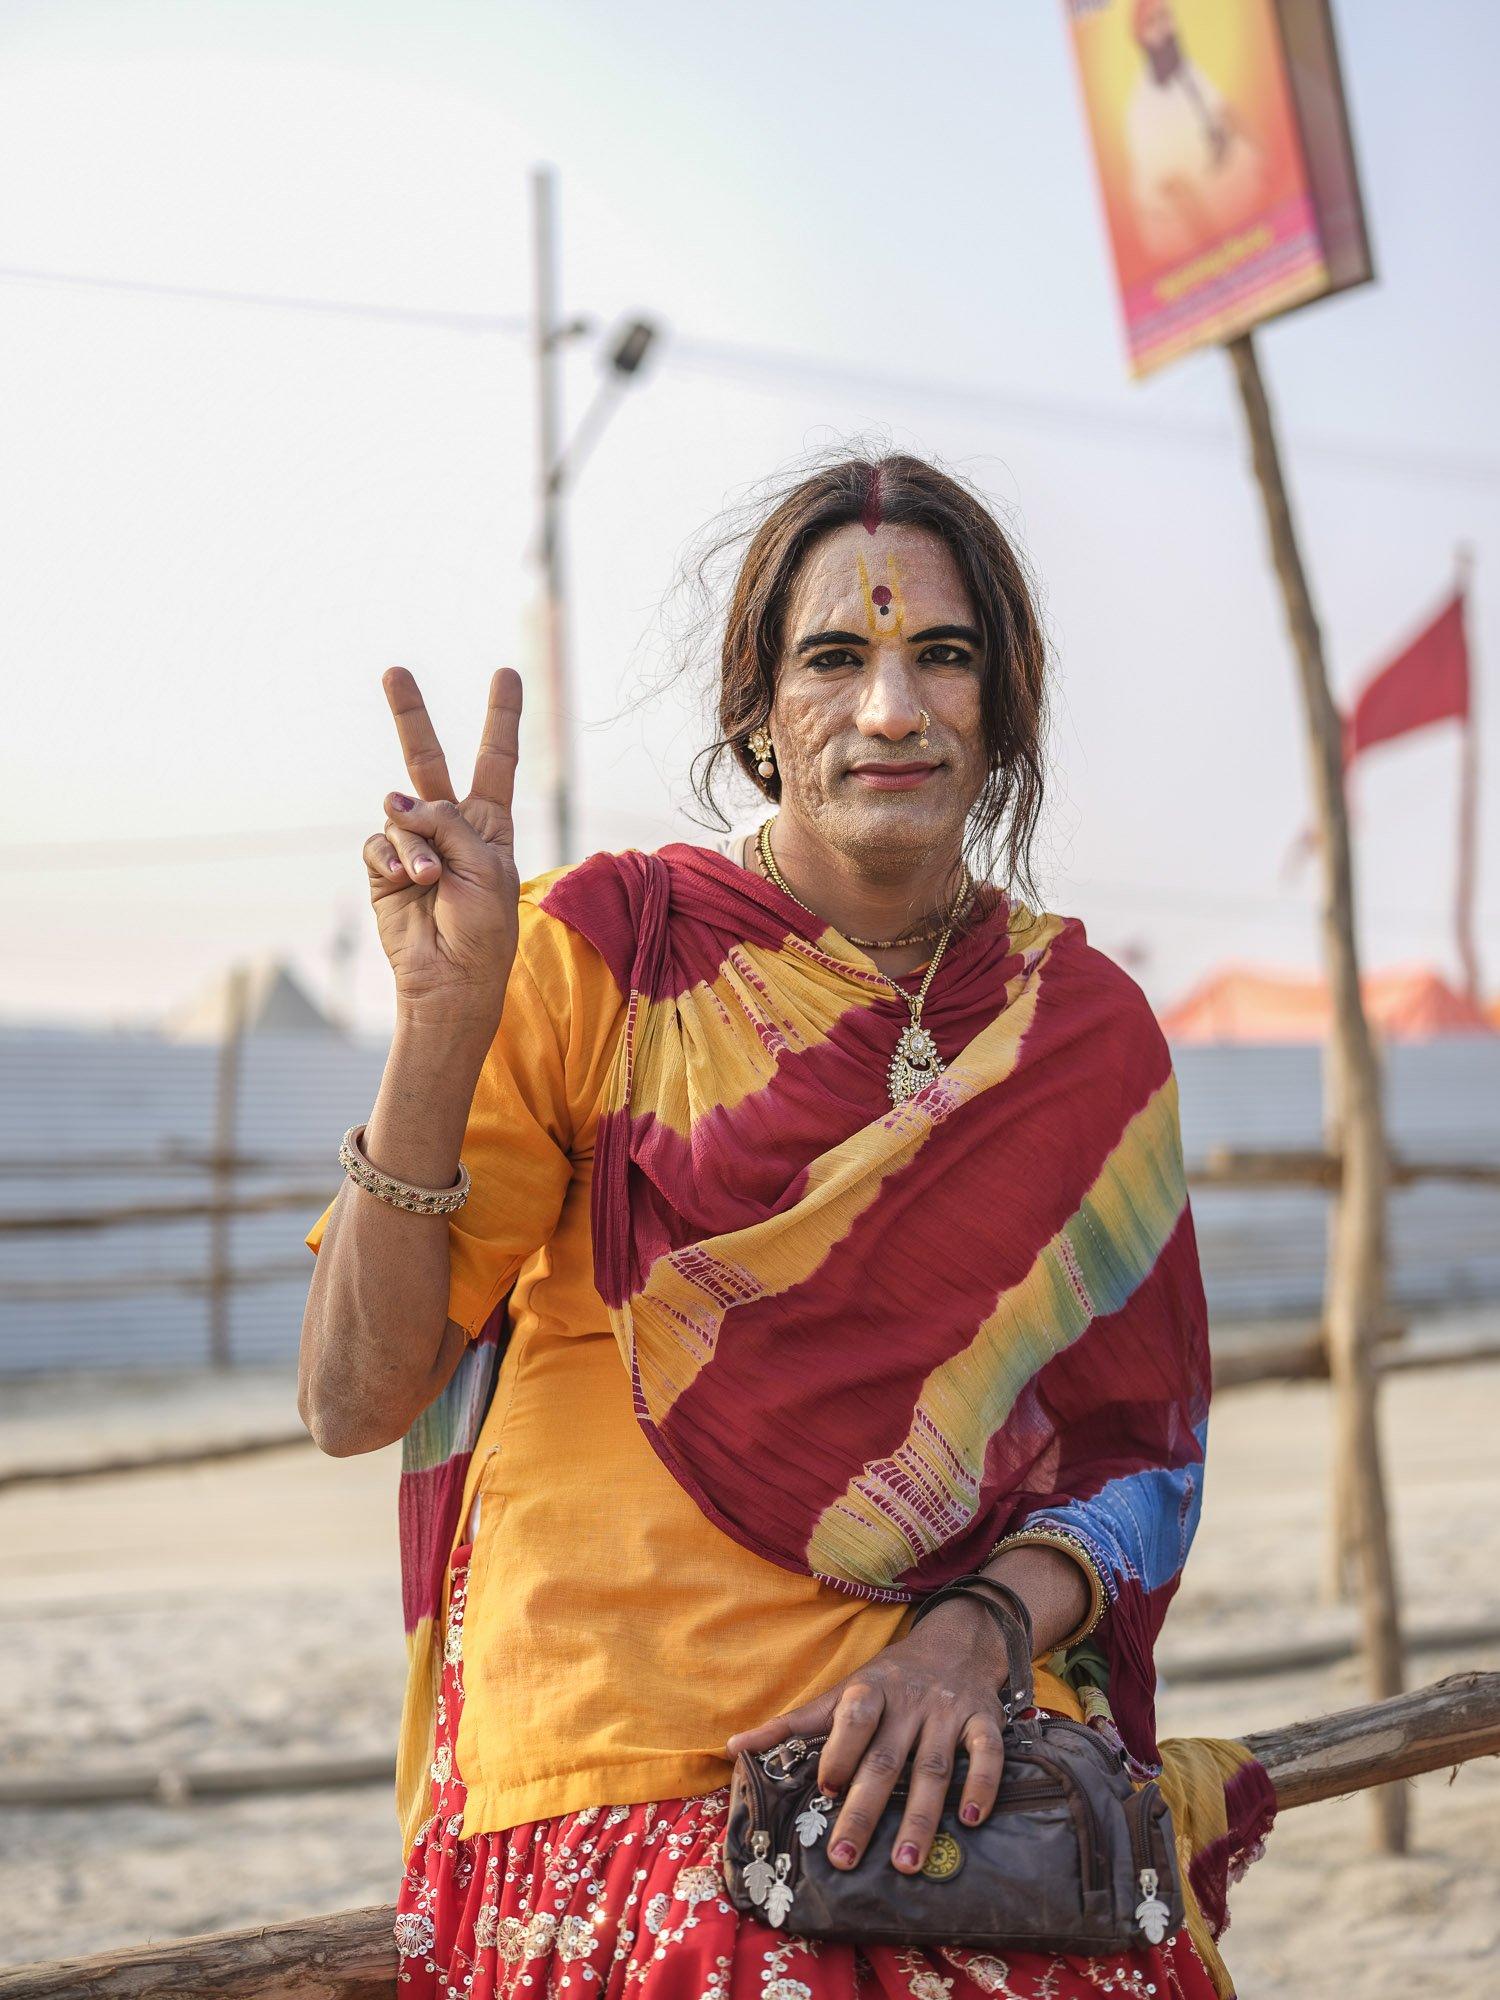 transgender portrait camp pilgrims Kumbh mela 2019 India Allahabad Prayagraj Ardh hindu religious Festival event rivers photographer jose jeuland photography